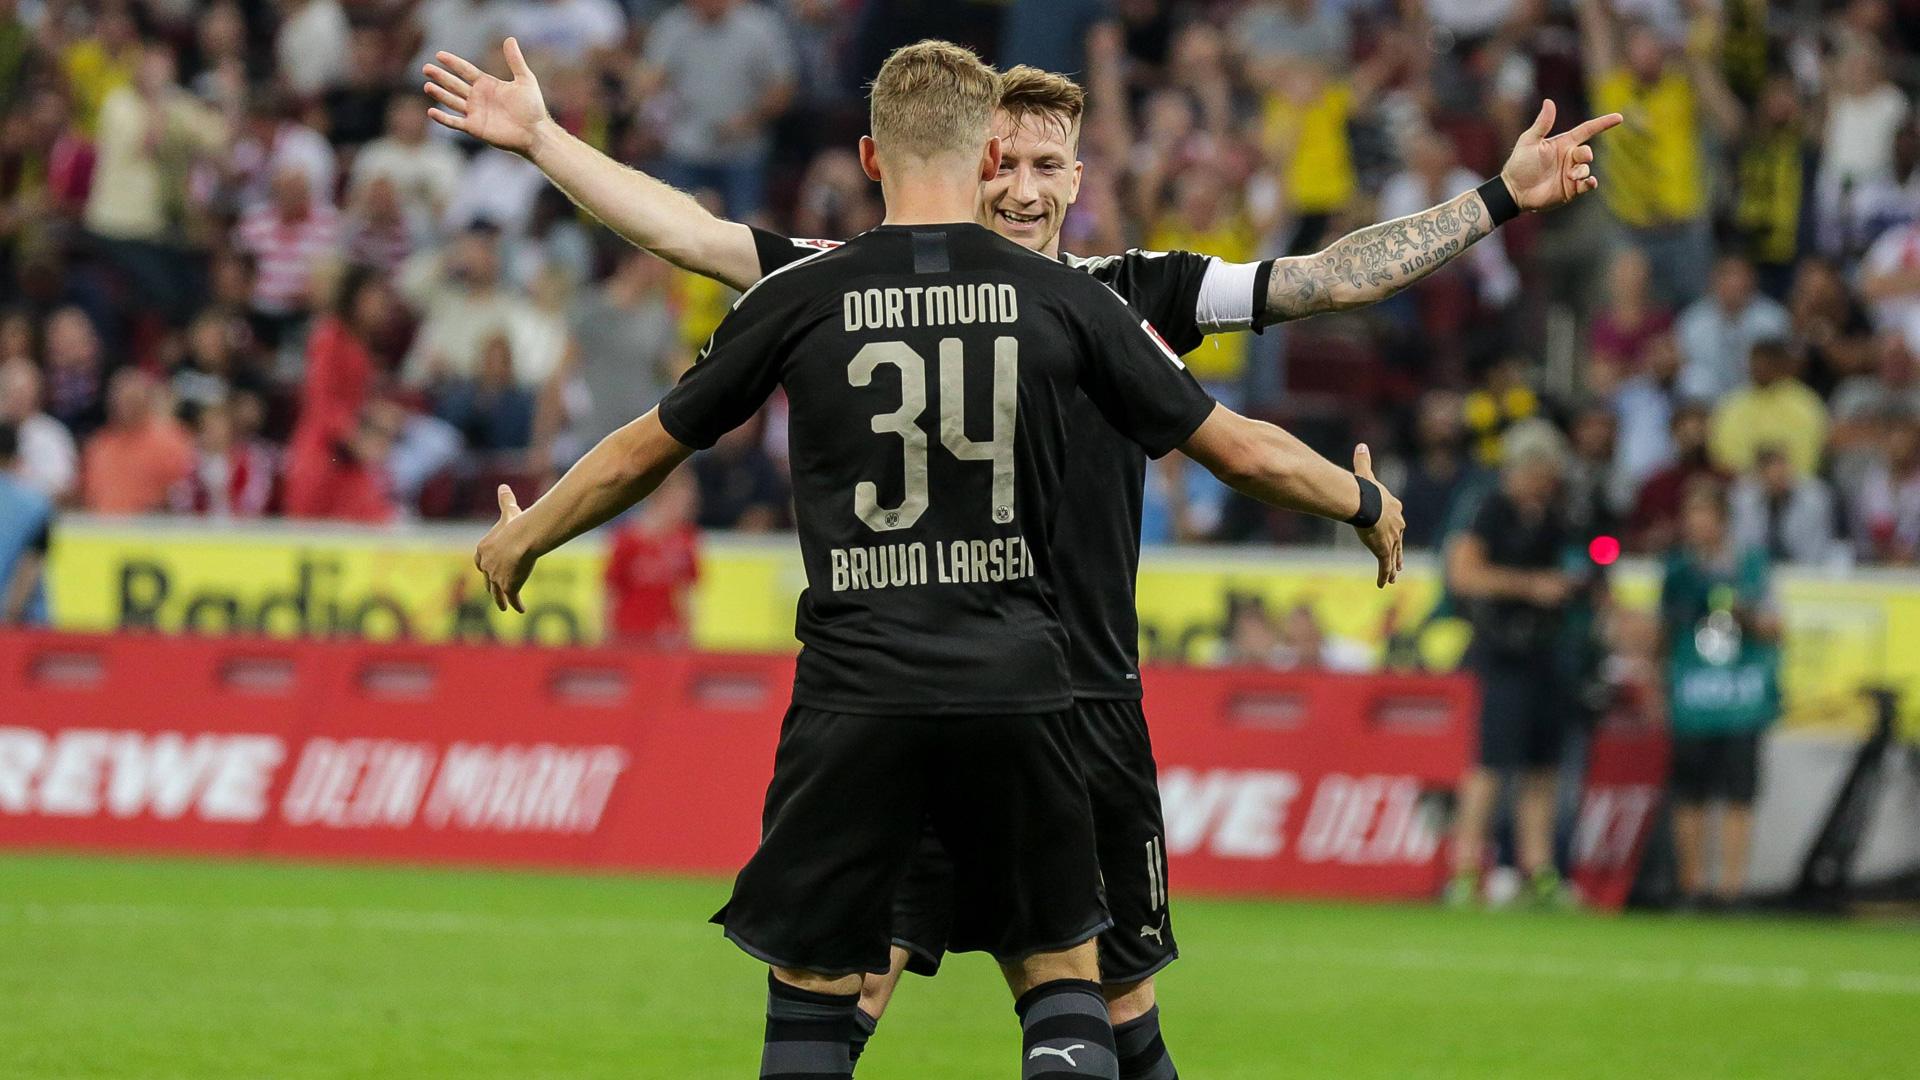 GERMANY ONLY Bruun Larsen Reus Borussia Dortmund BVB